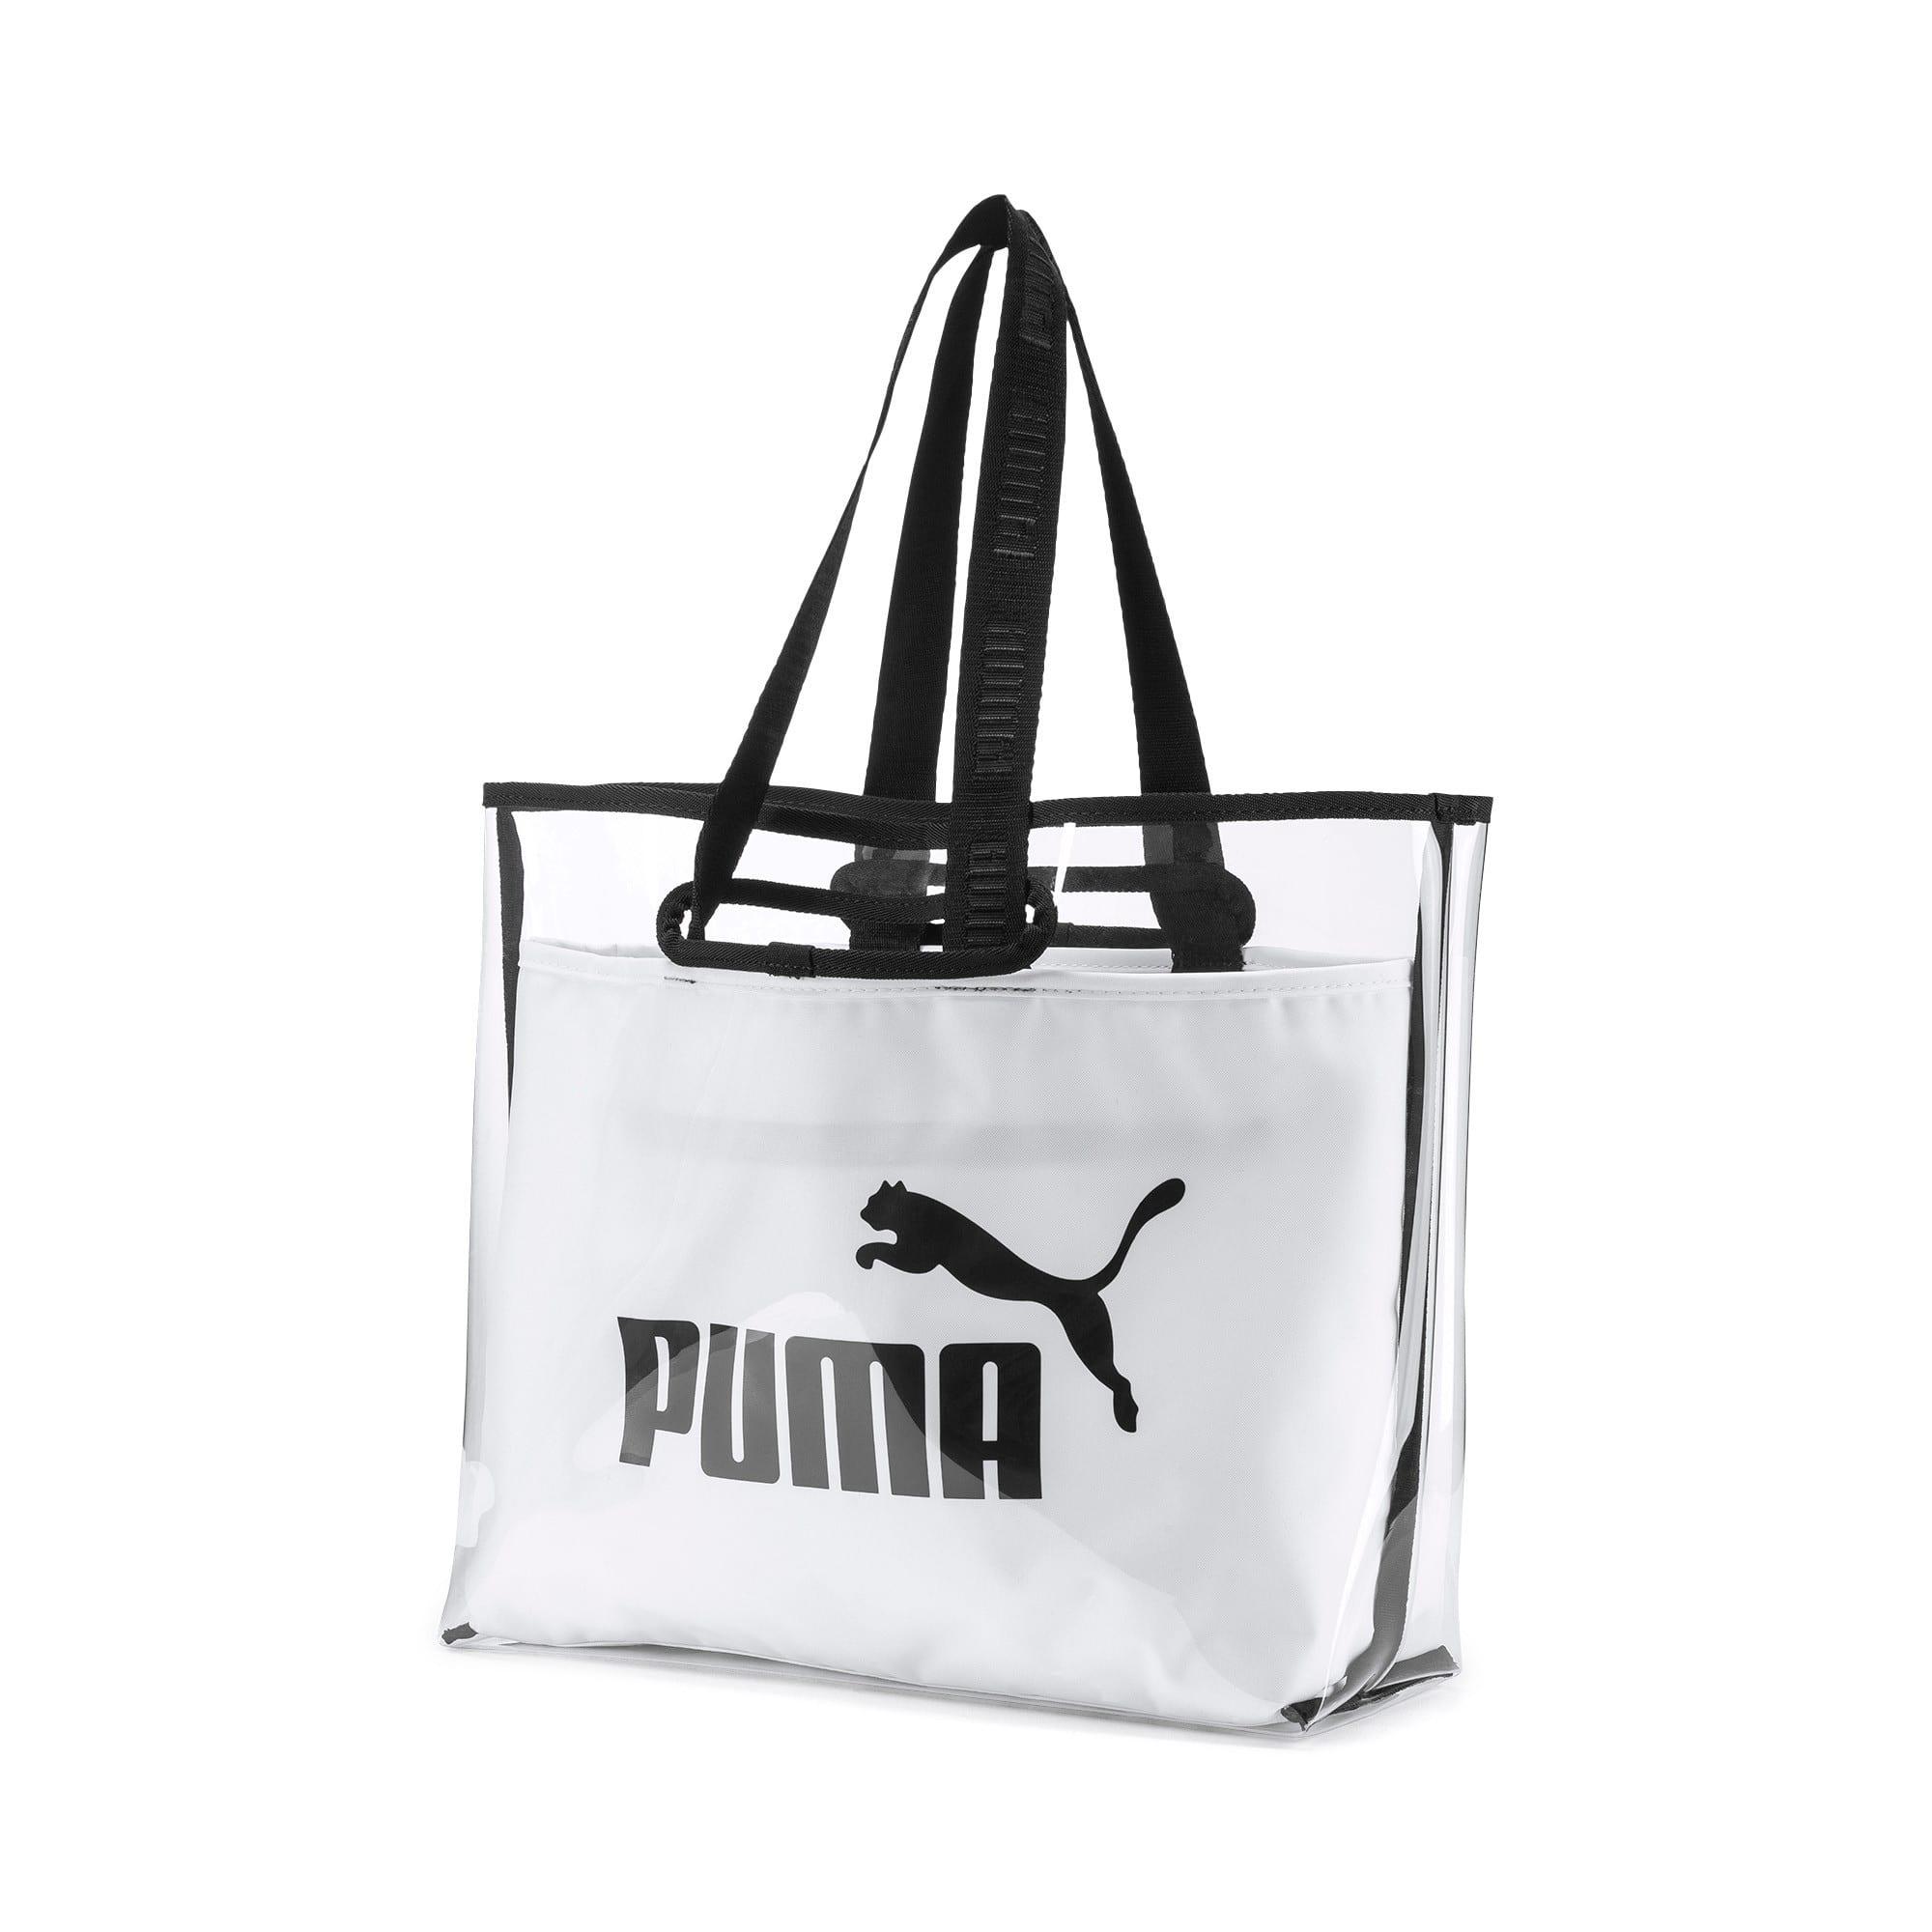 Thumbnail 2 of Damen Twin Shopper, Puma White, medium